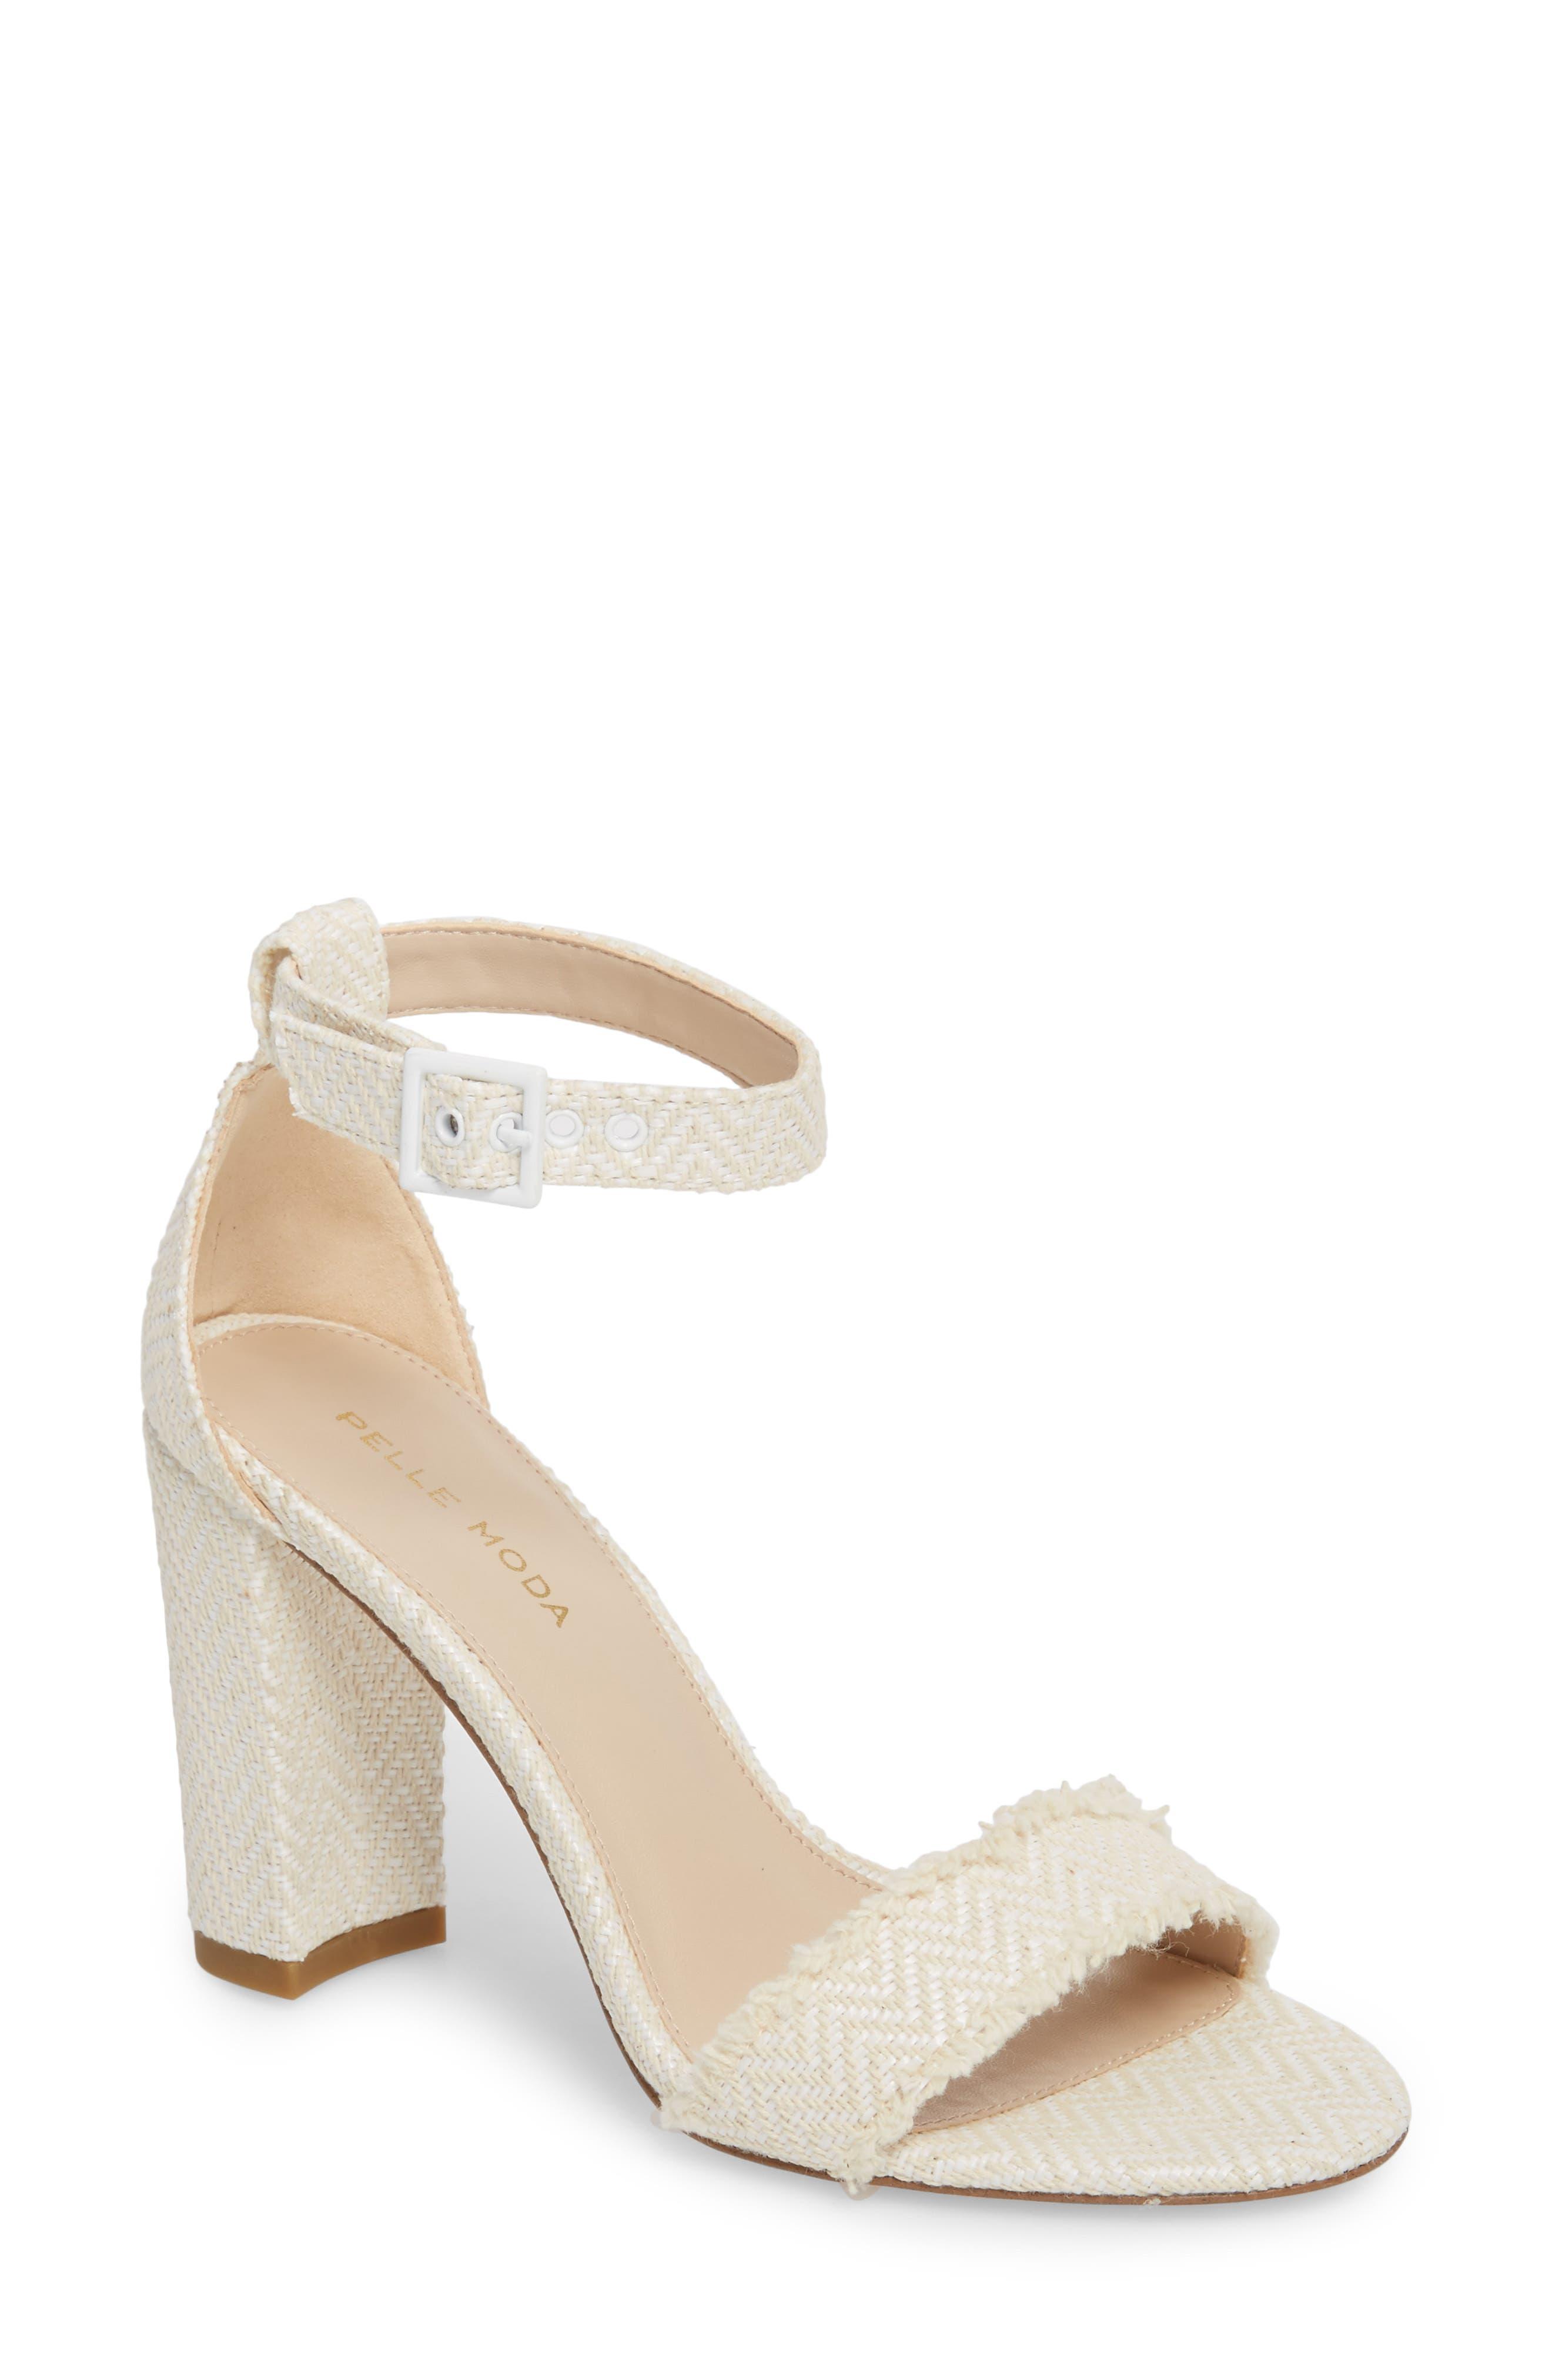 Bonnie Ankle Strap Sandal,                             Main thumbnail 1, color,                             White Herringbone